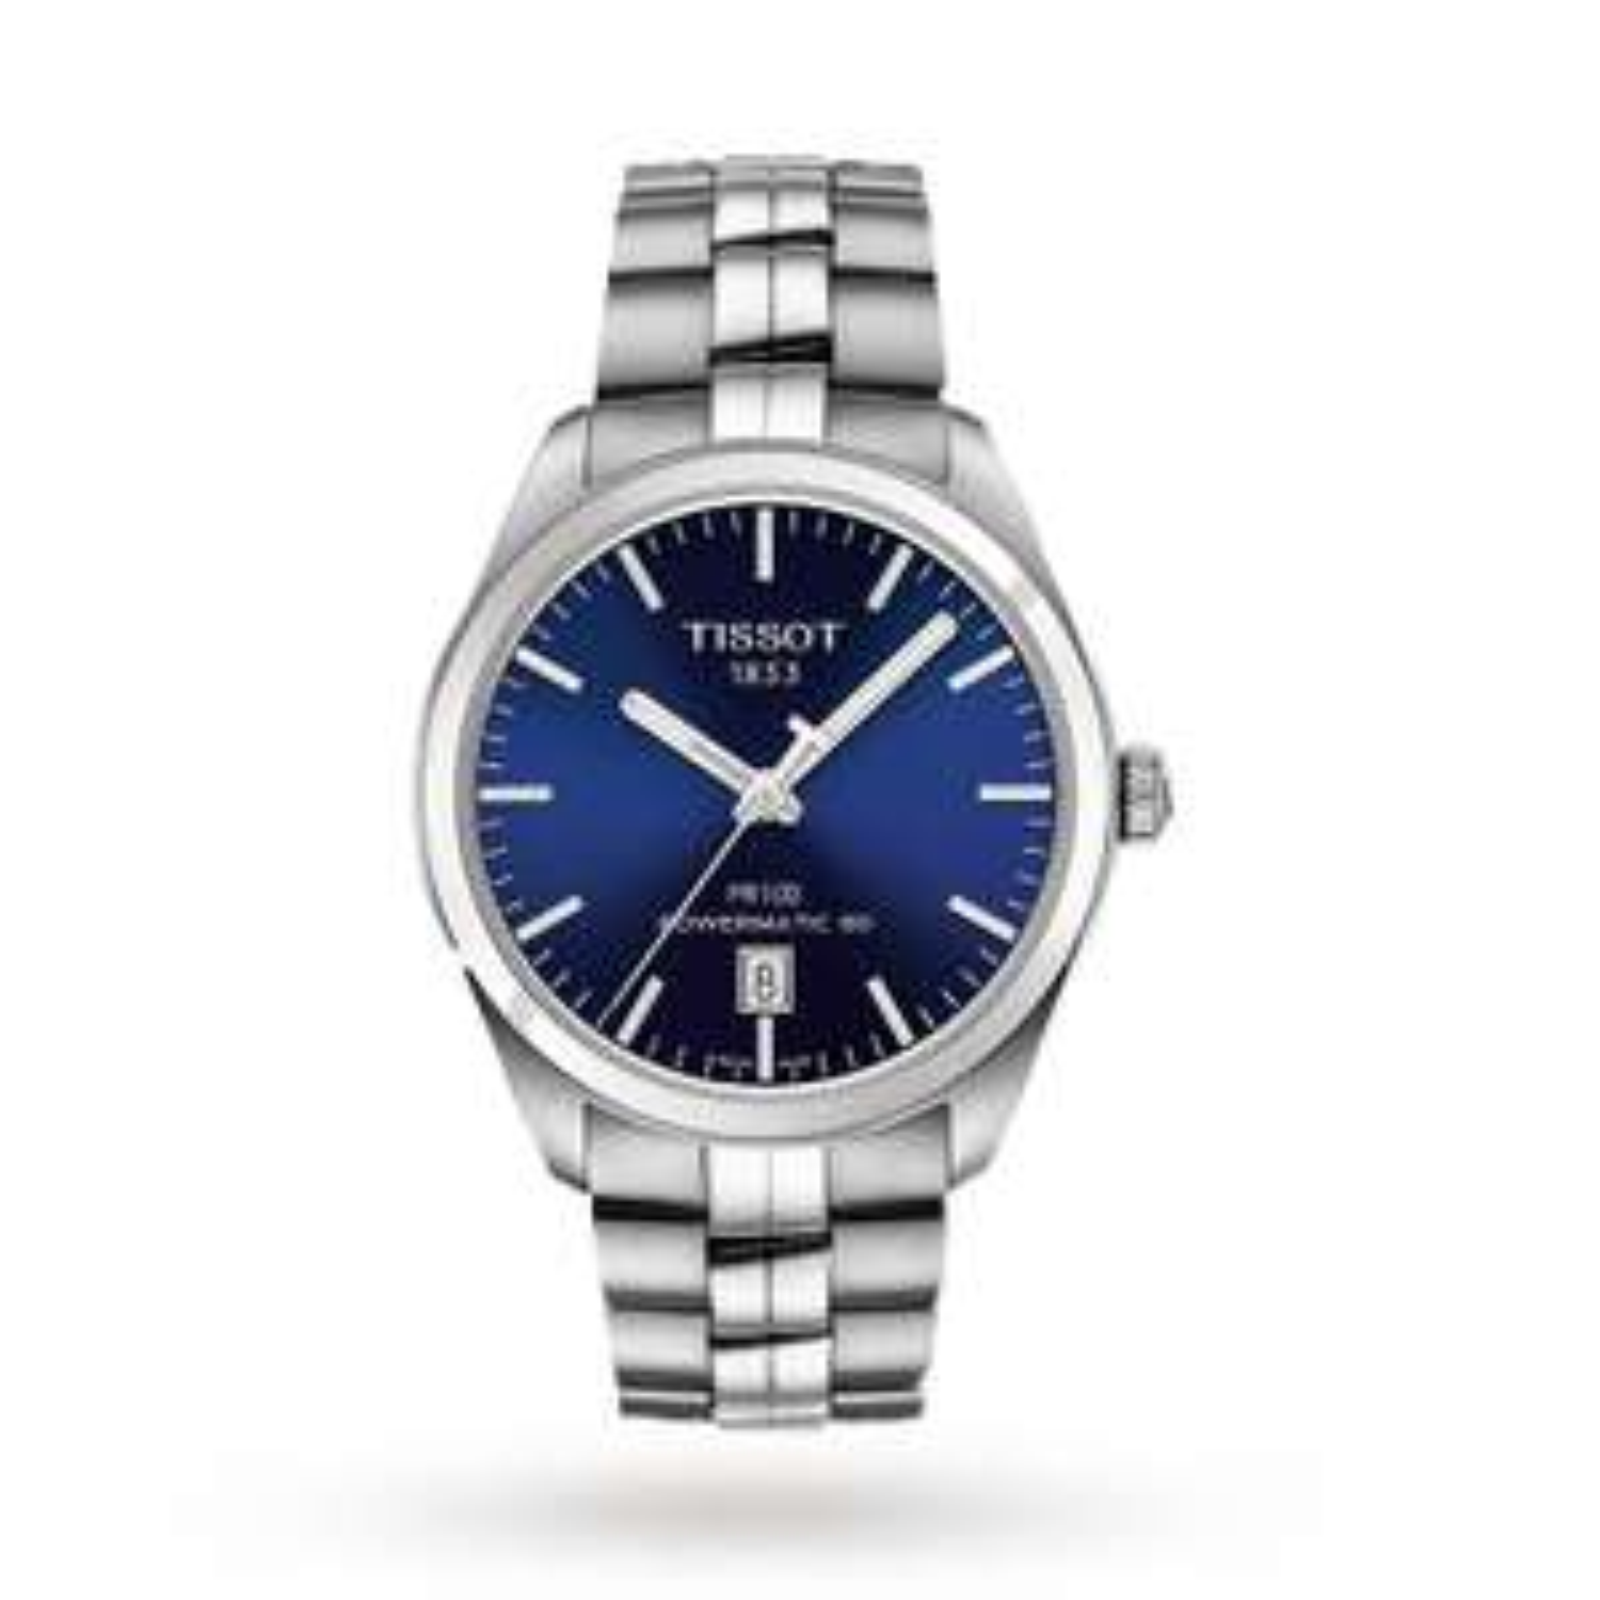 Tissot Pr100 Automatic Mens Watch £360 delivered @ Goldsmiths